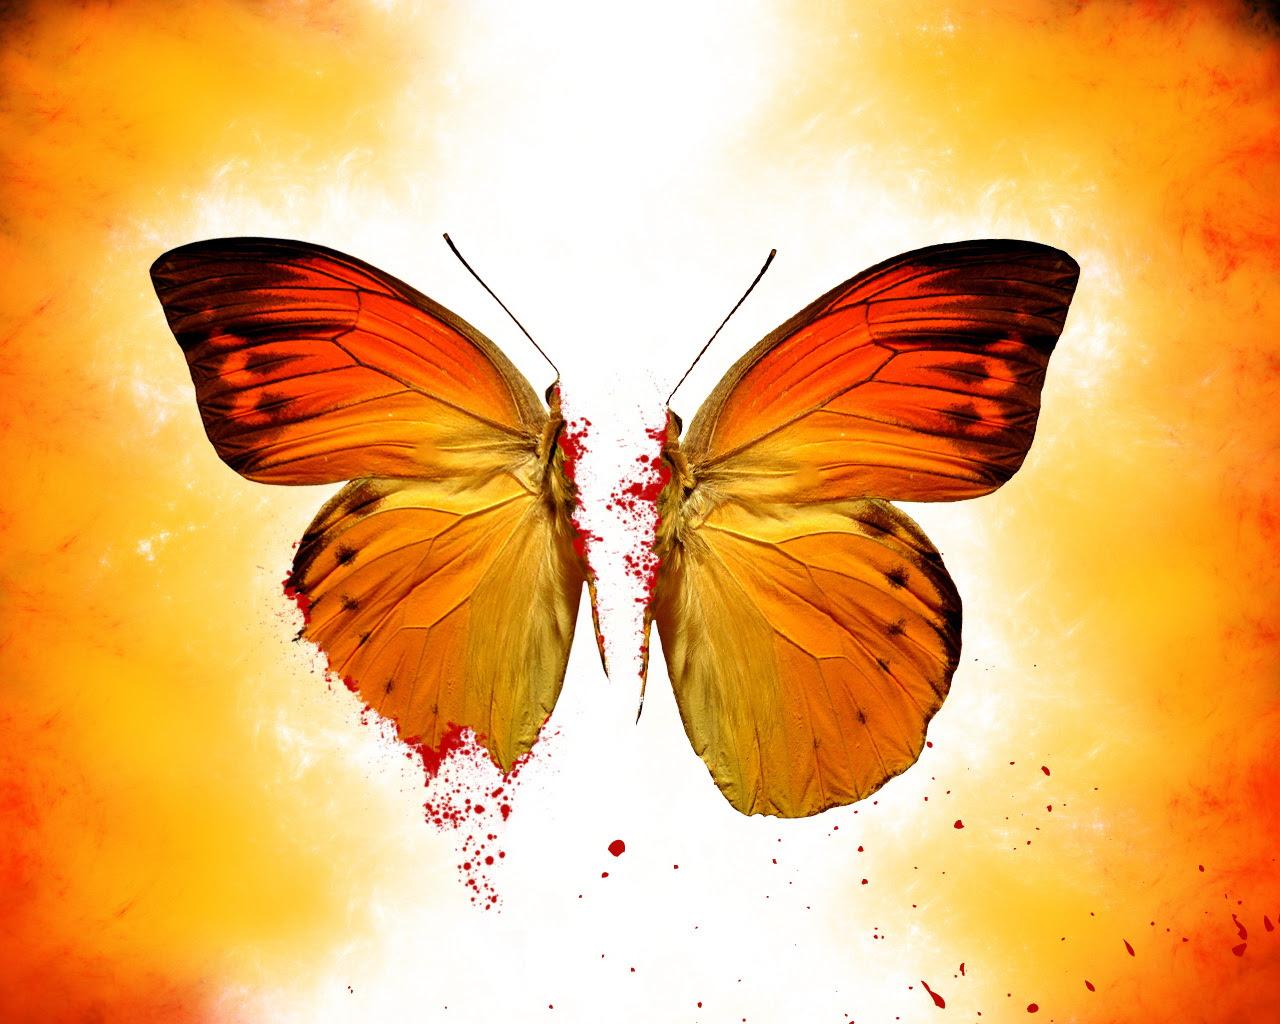 Butterfly beautiful Wallpaper Wallpapers - HD Wallpapers 87006